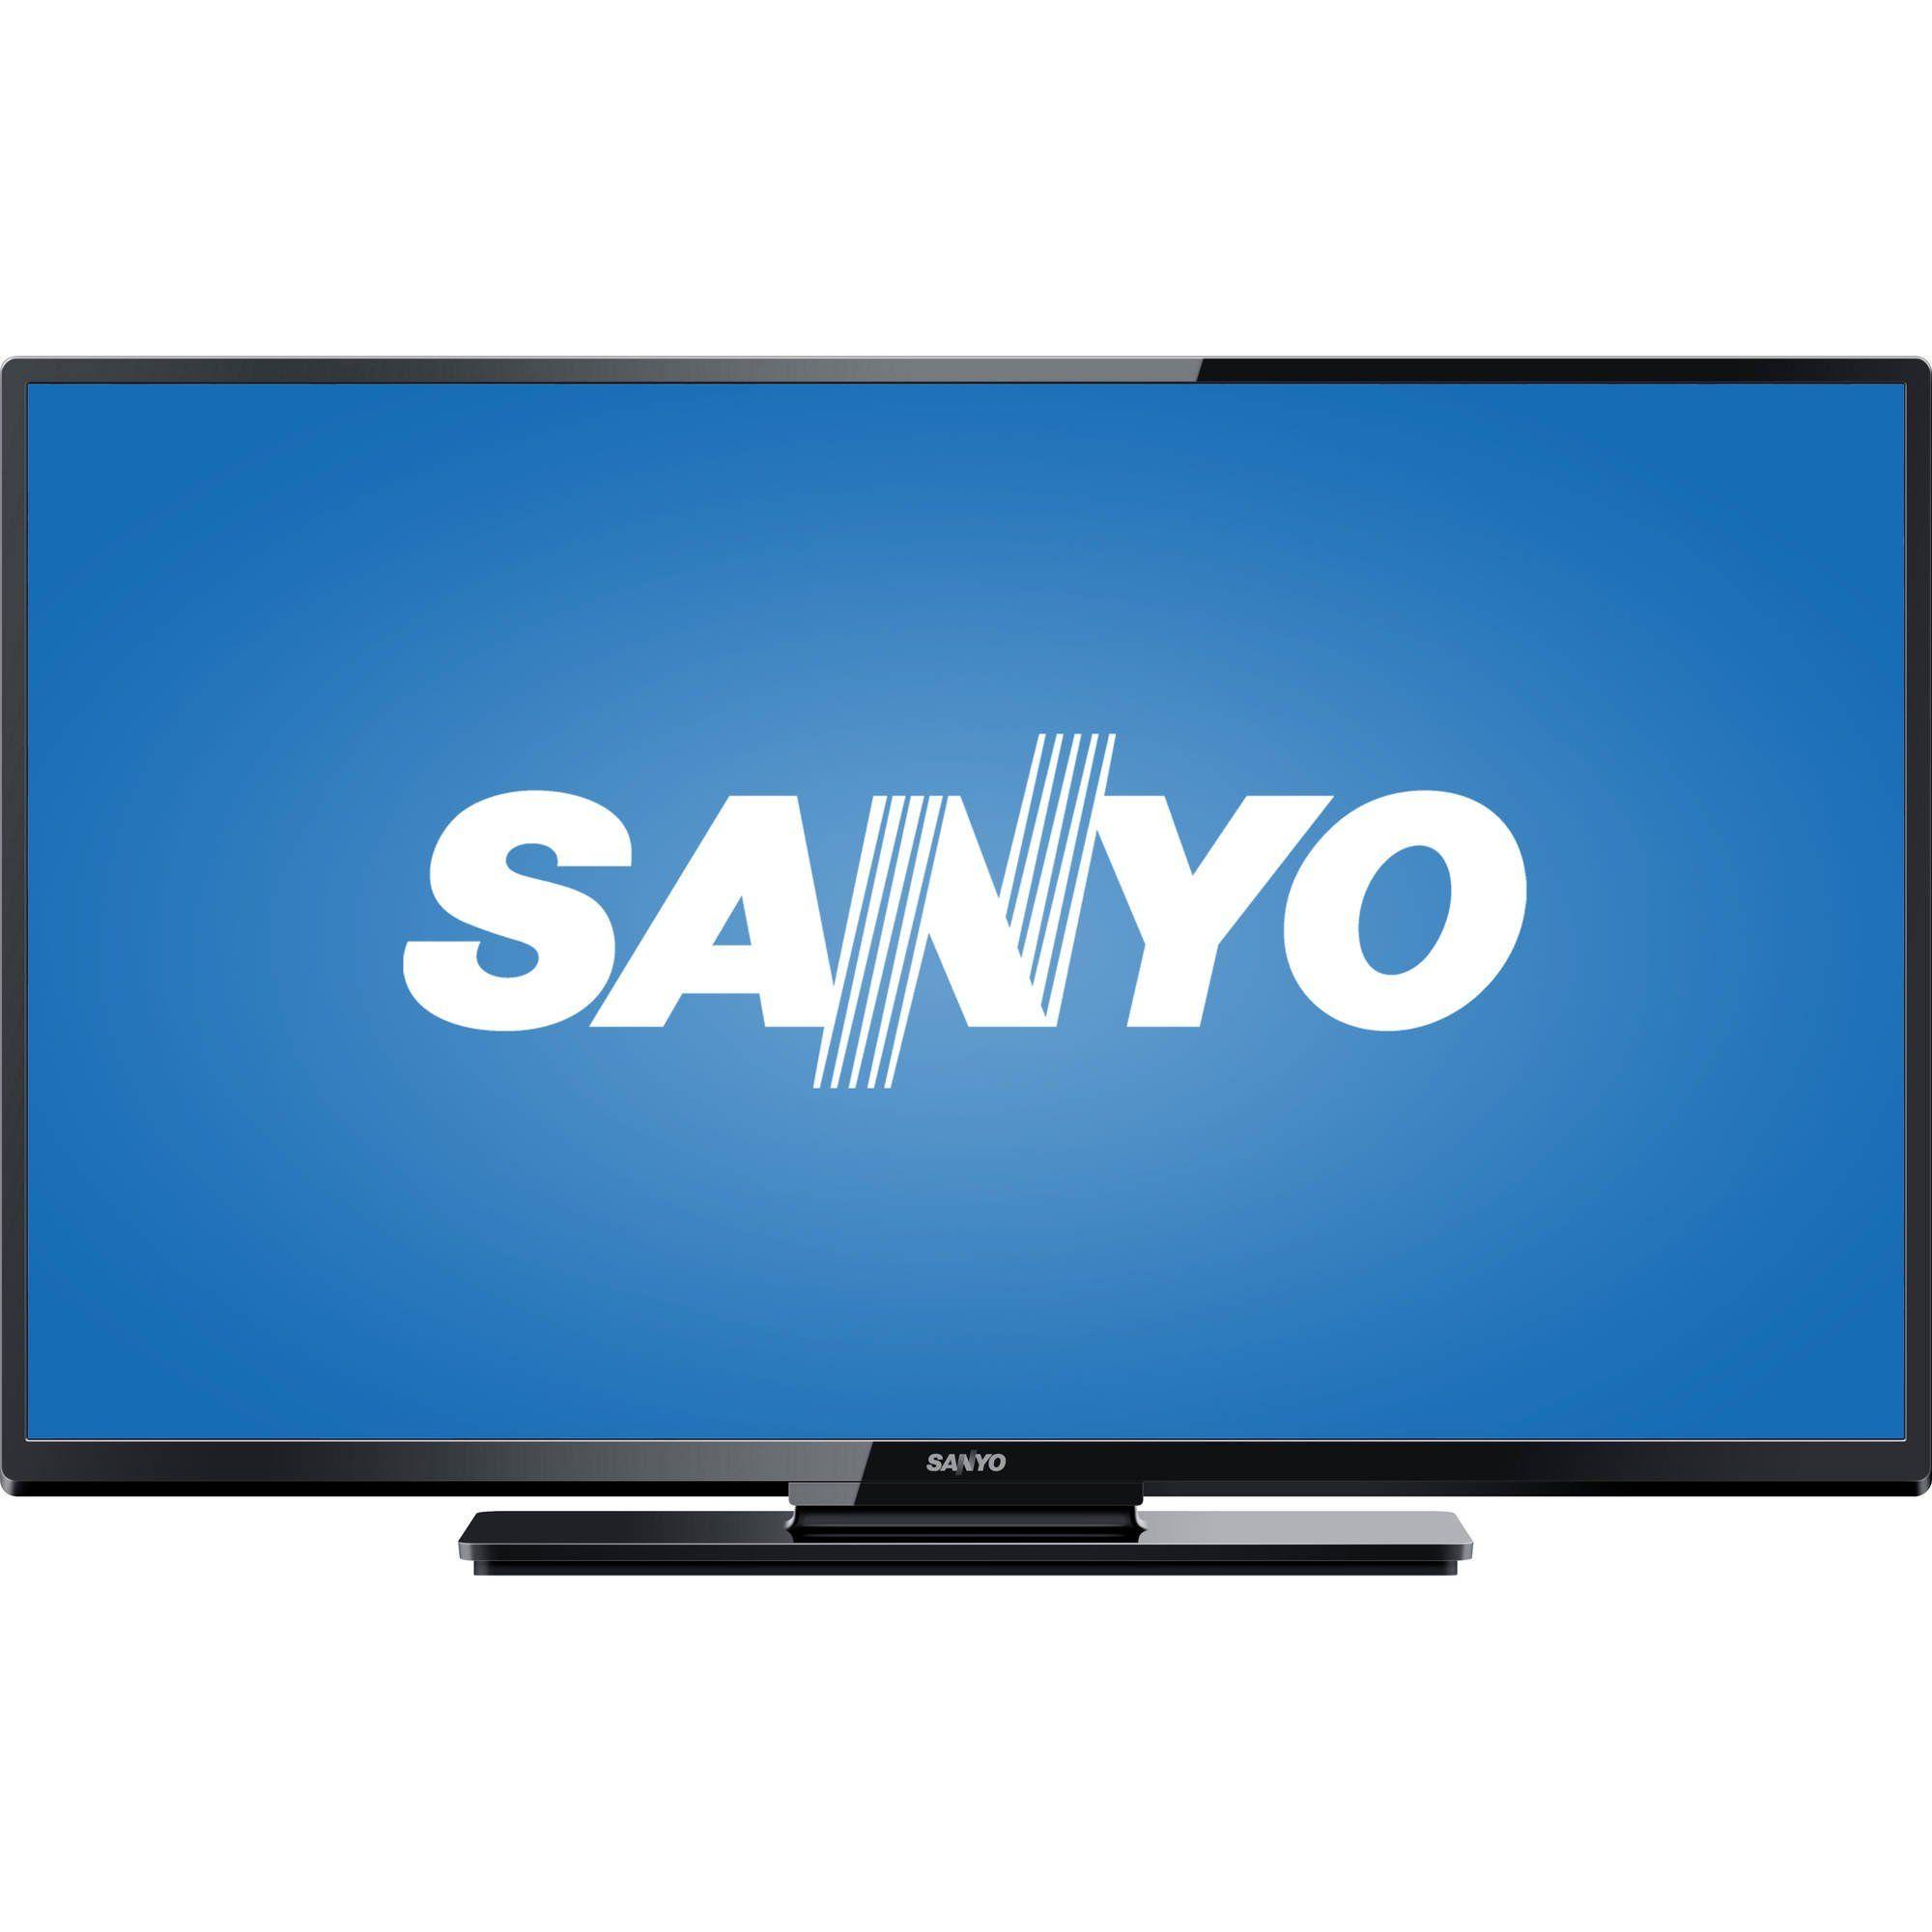 Sanyo Fw43d25f 43 Quot 1080p 120hz Class Led Hdtv Sanyo Led Tv Tv